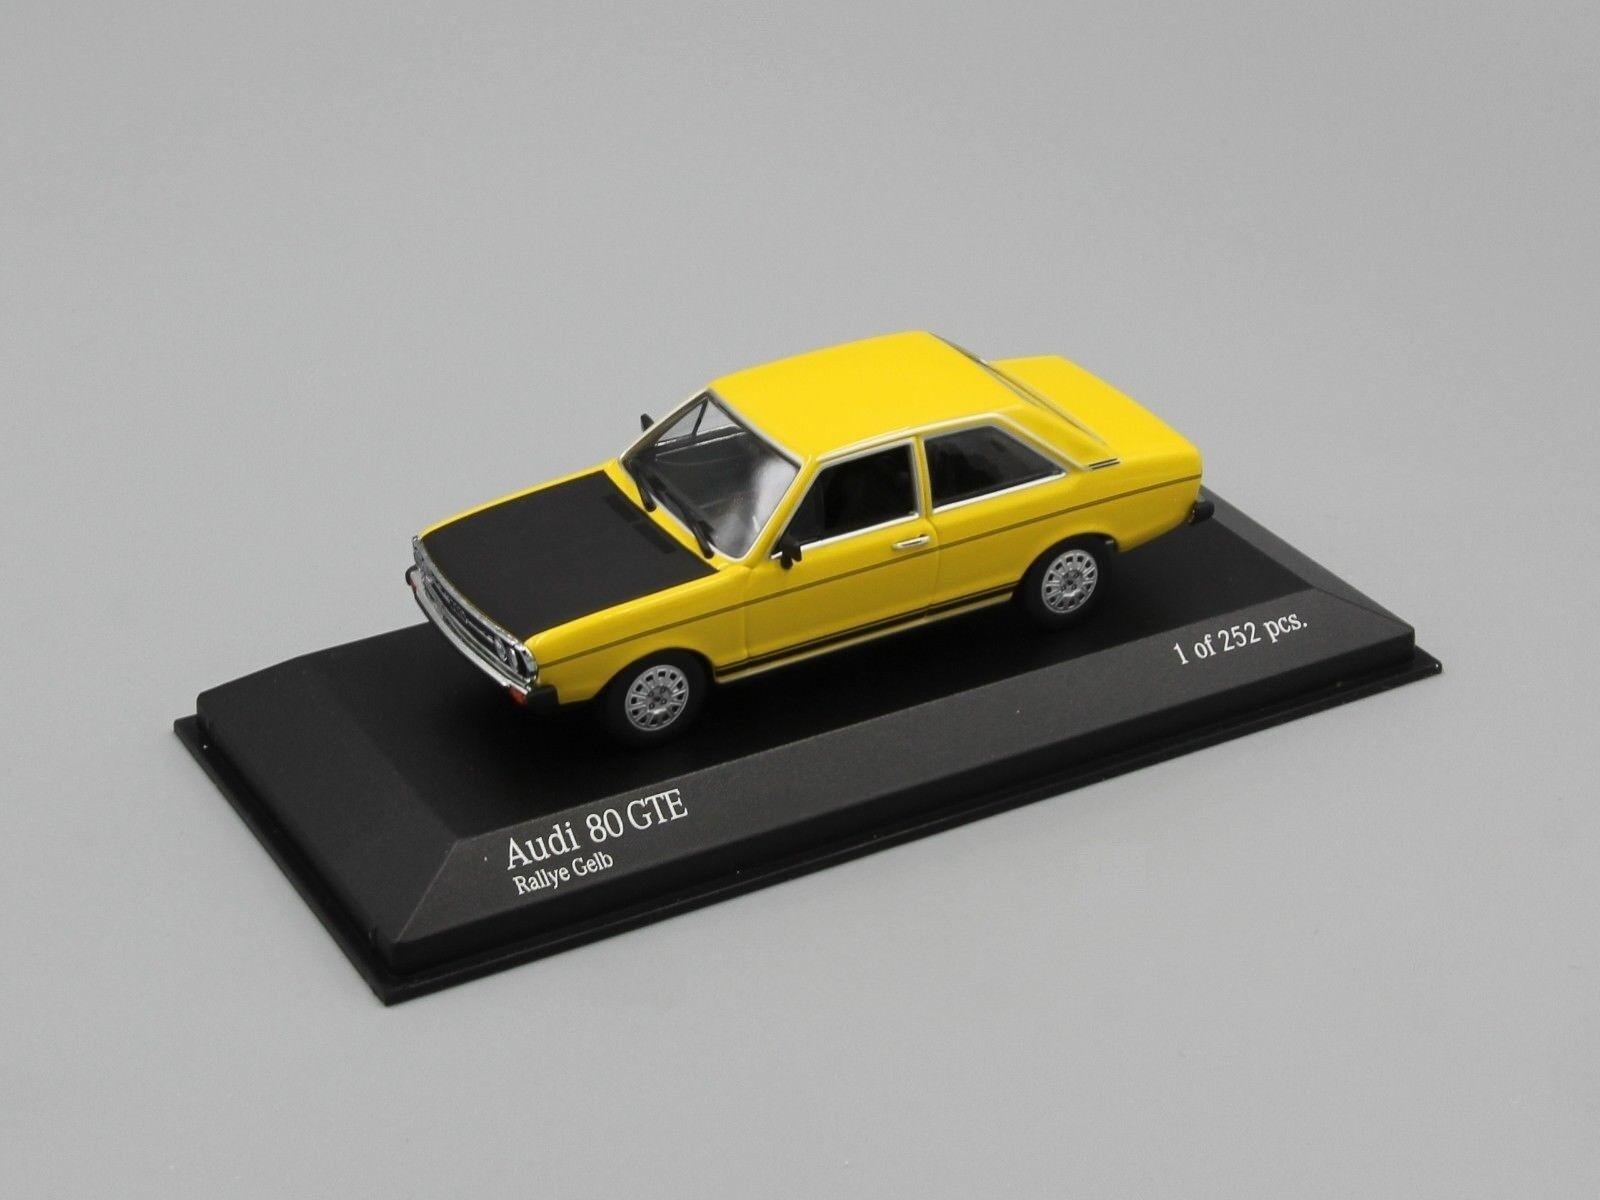 AUDI 80 GTE RALLYE giallo 1975 MINICHAMPS 400015004 1 43 giallo giallo GALLIA GT E